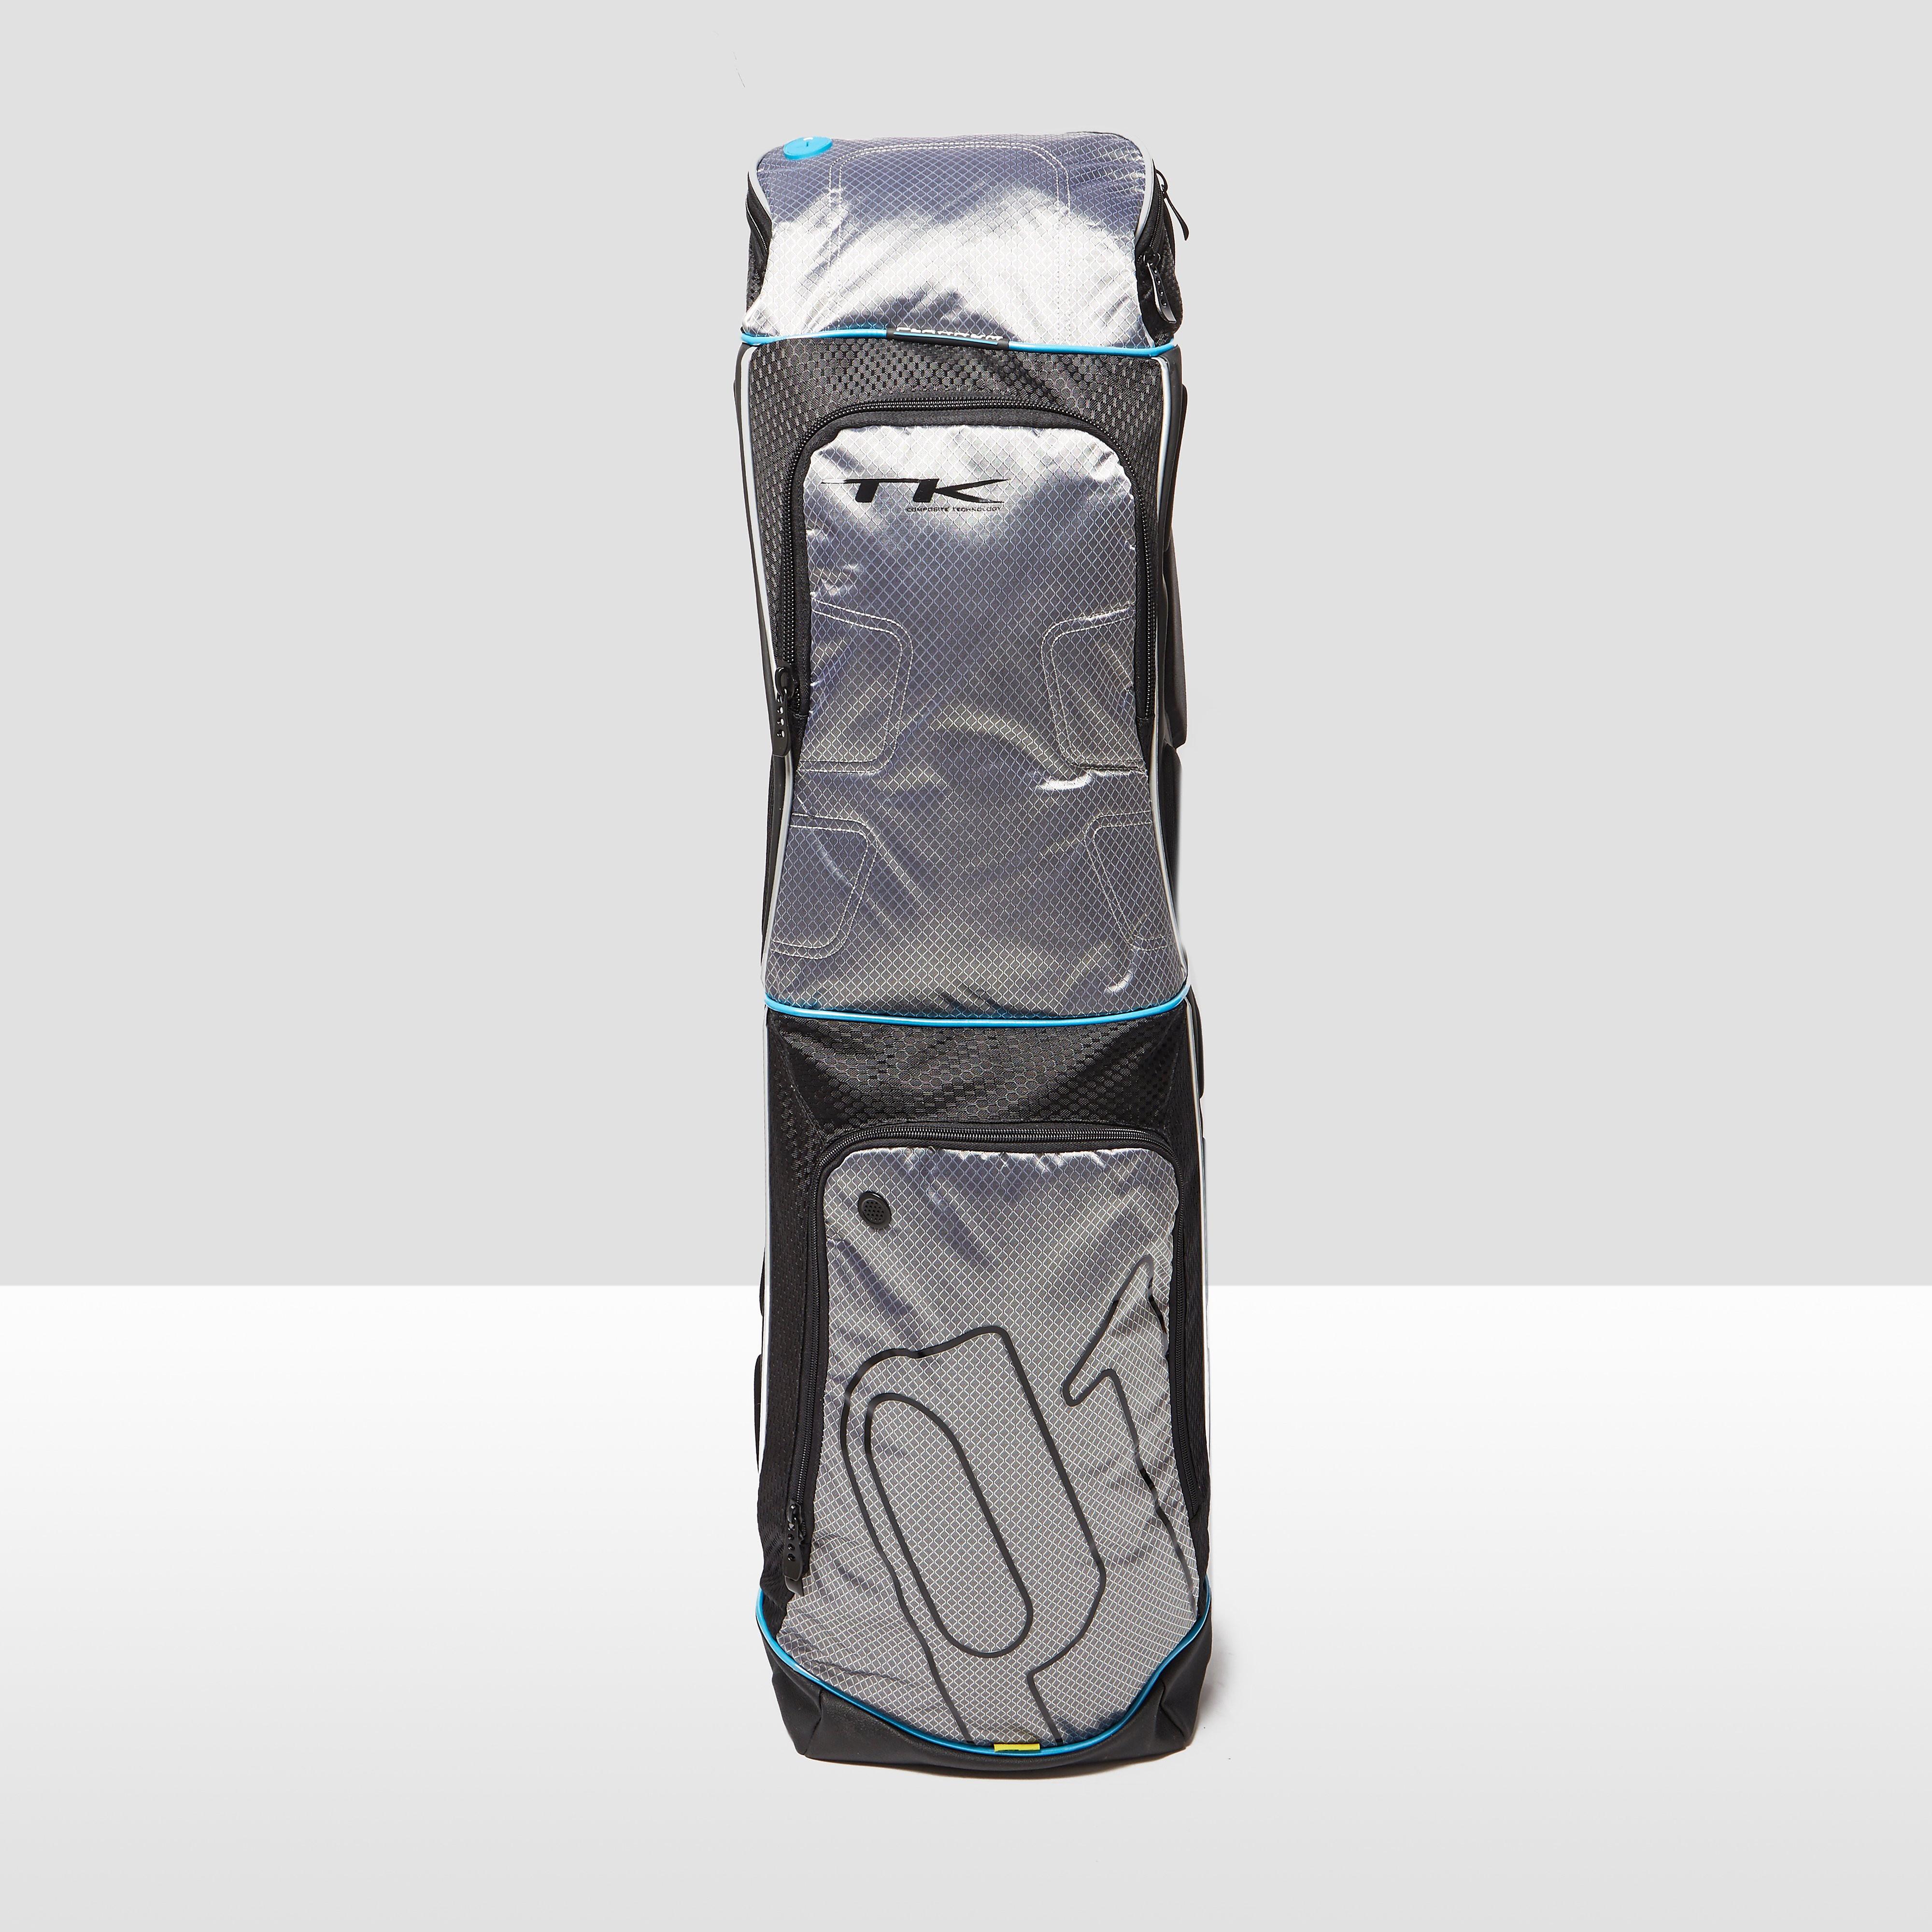 Tk hockey P1 STICK Bag